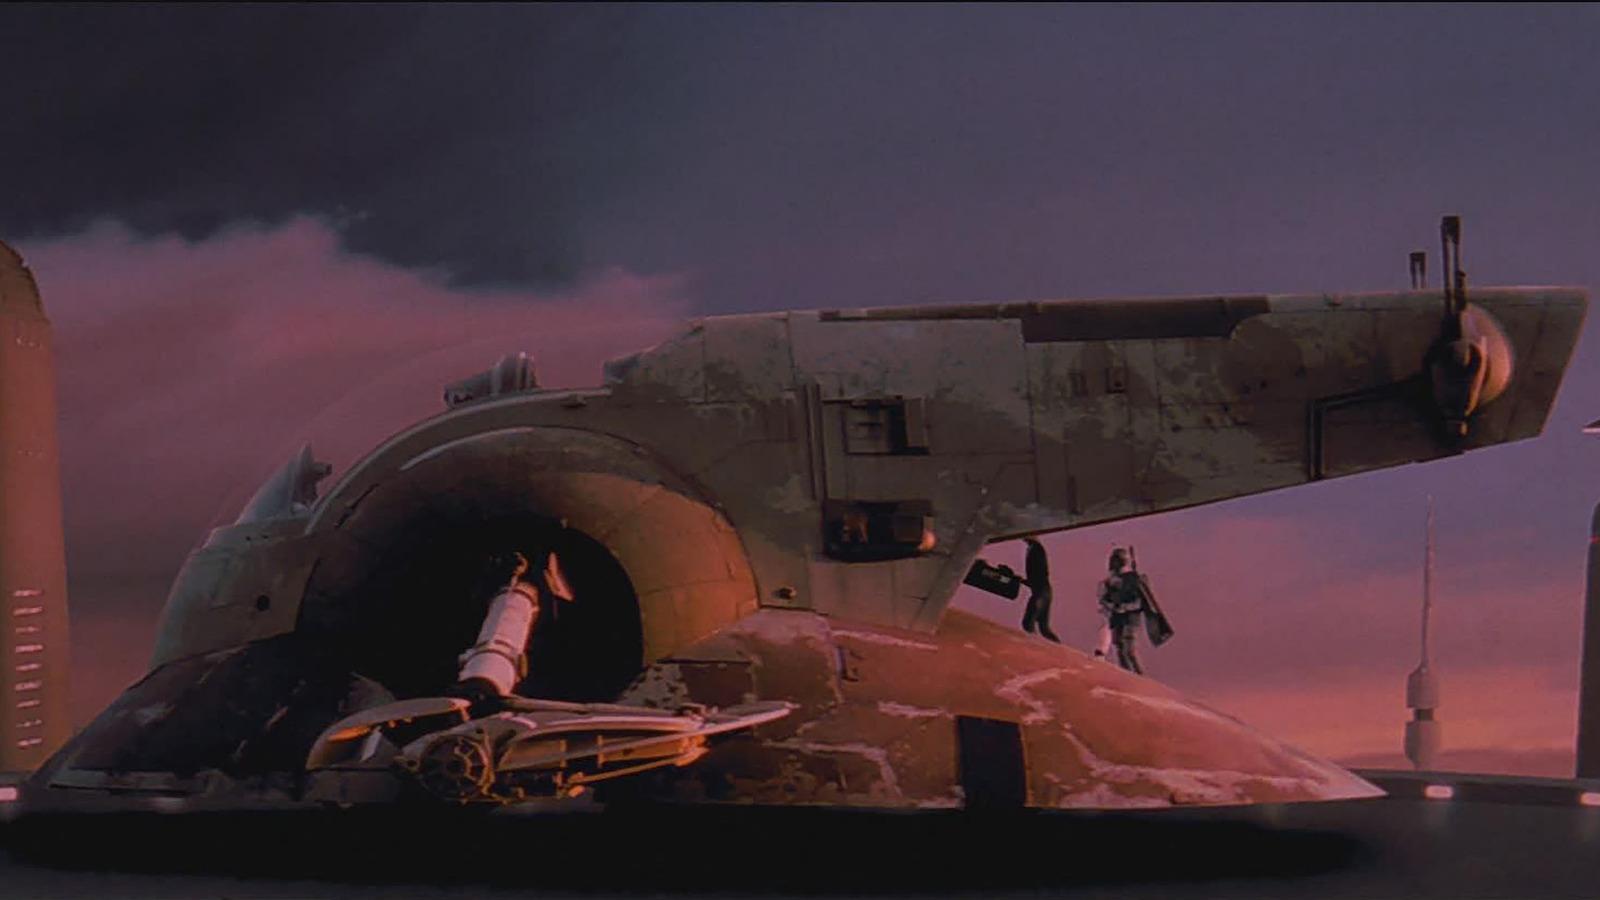 Daily Podcast: Star Wars, Cobra Kai, Roger Rabbit And Flight Of The Navigator